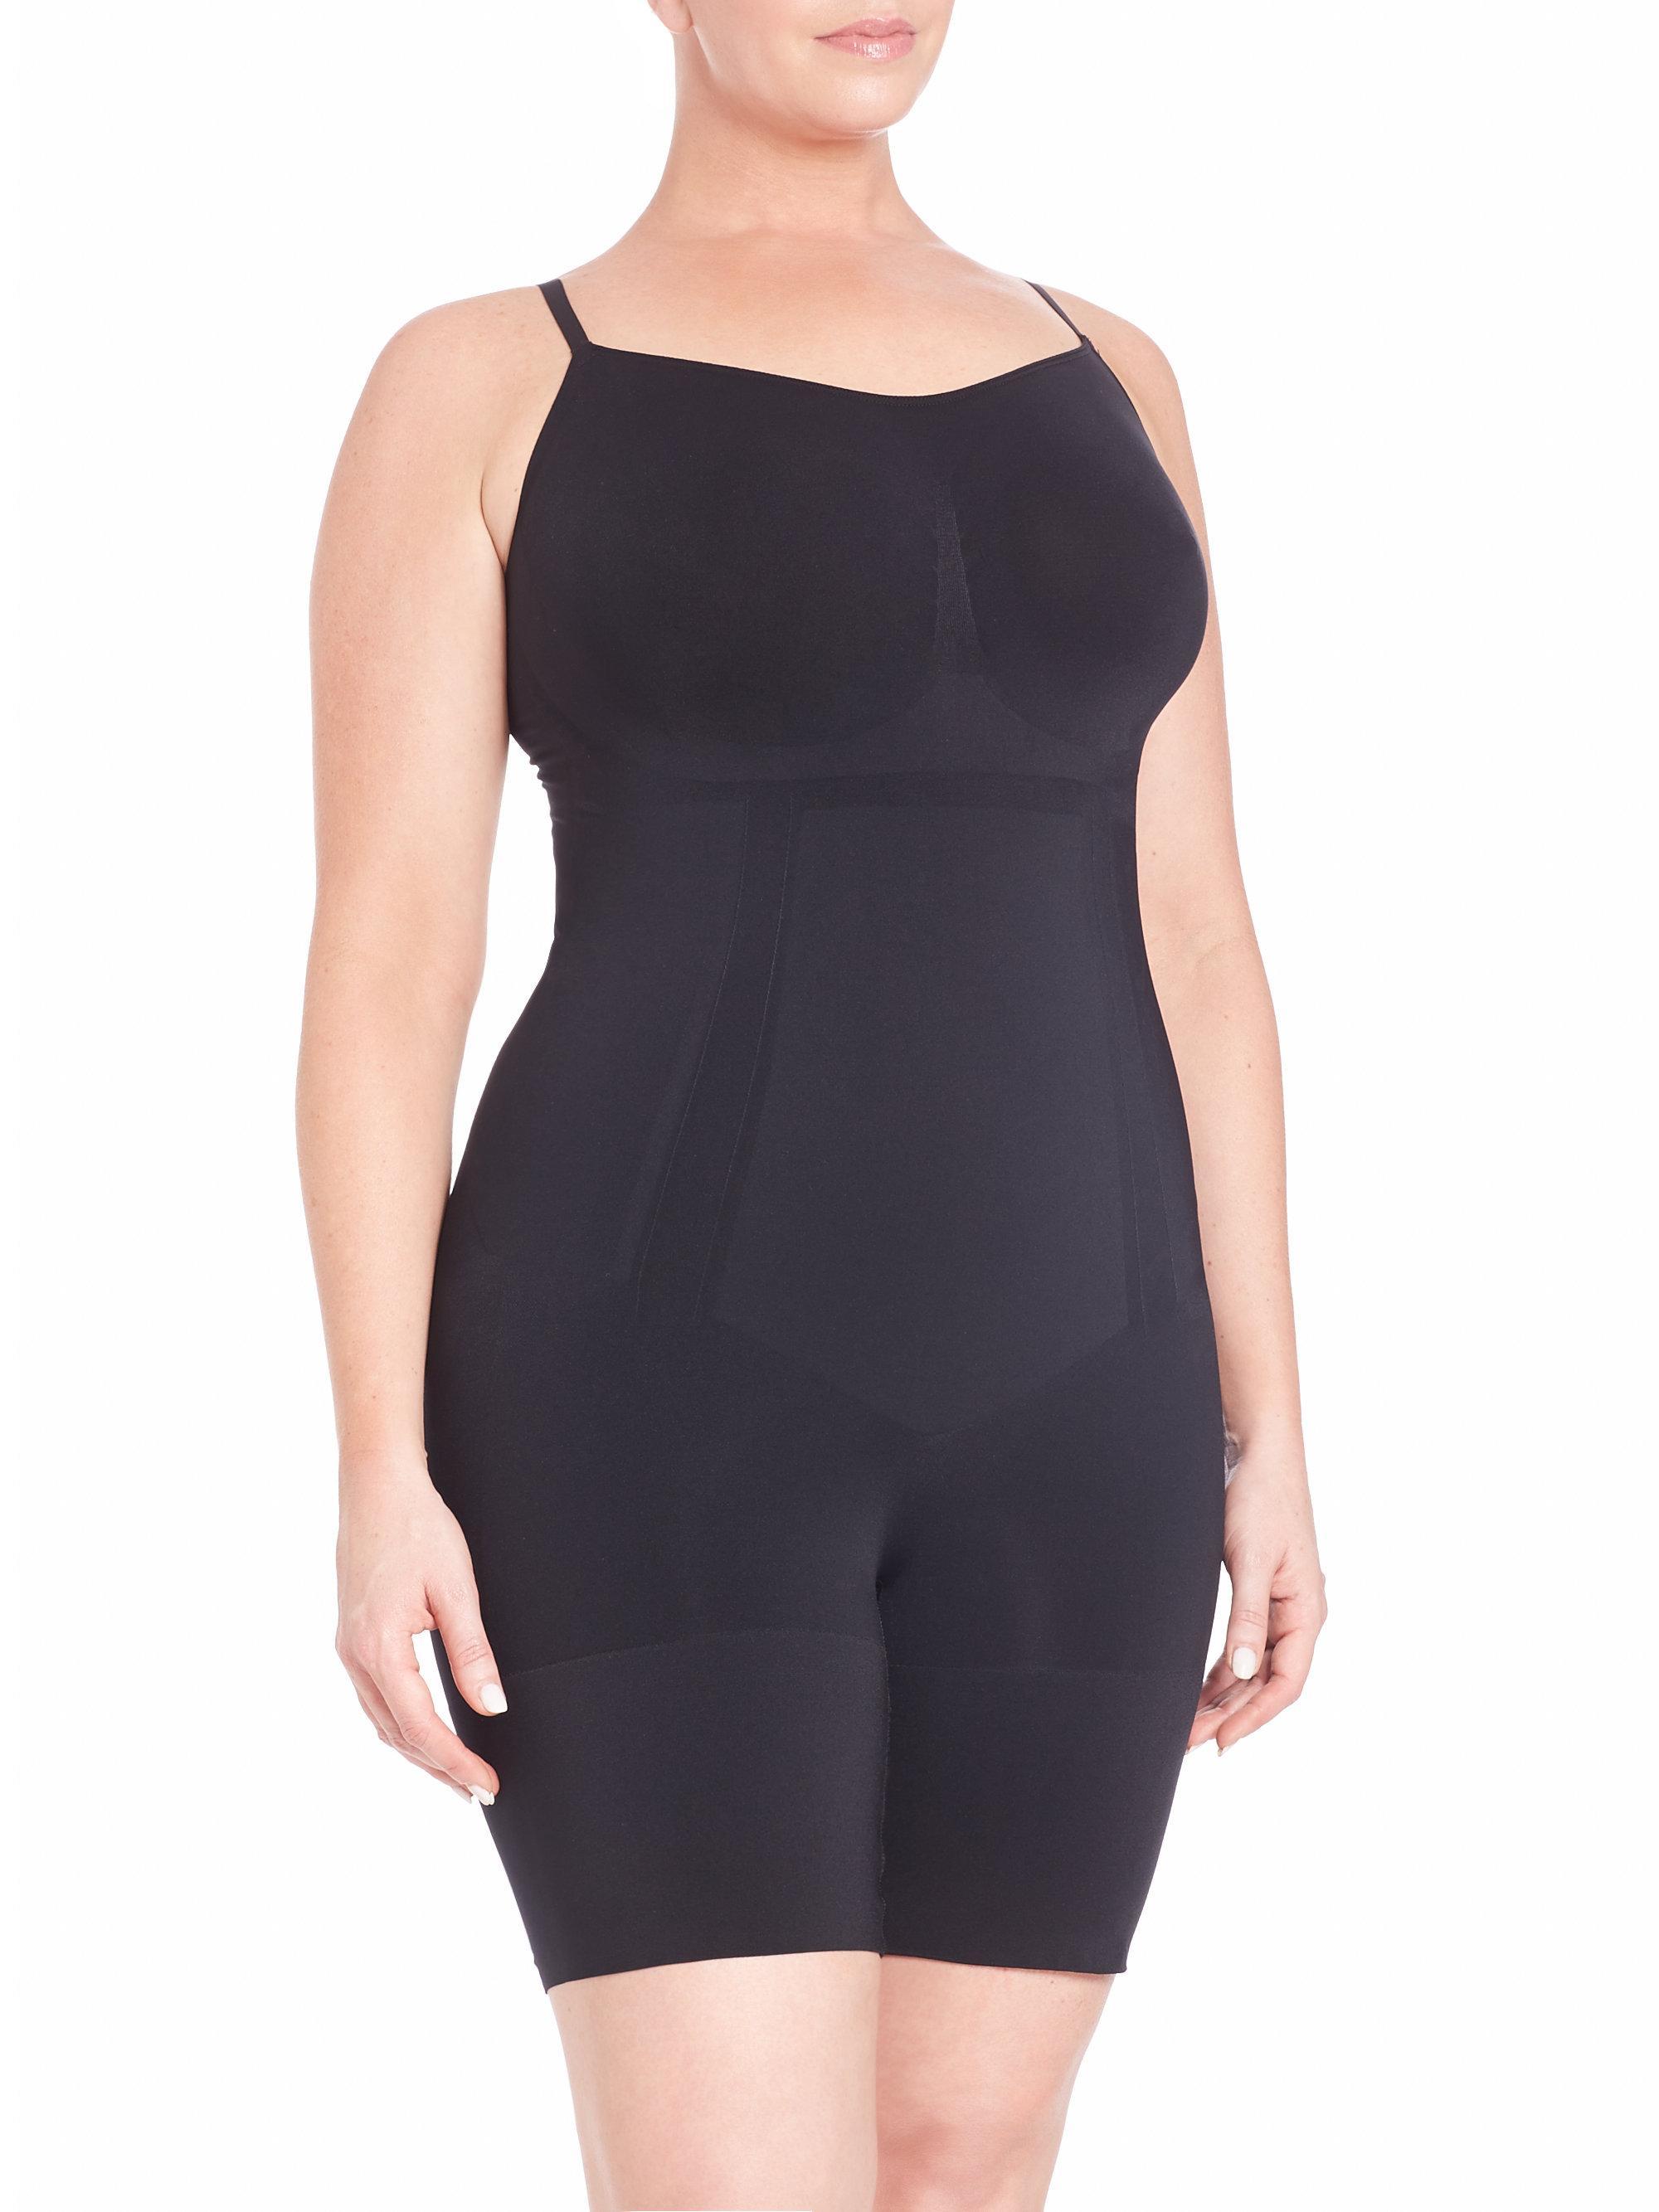 98d4e580e73dc Lyst - Spanx Oncore Mid-thigh Plus-size Bodysuit in Black